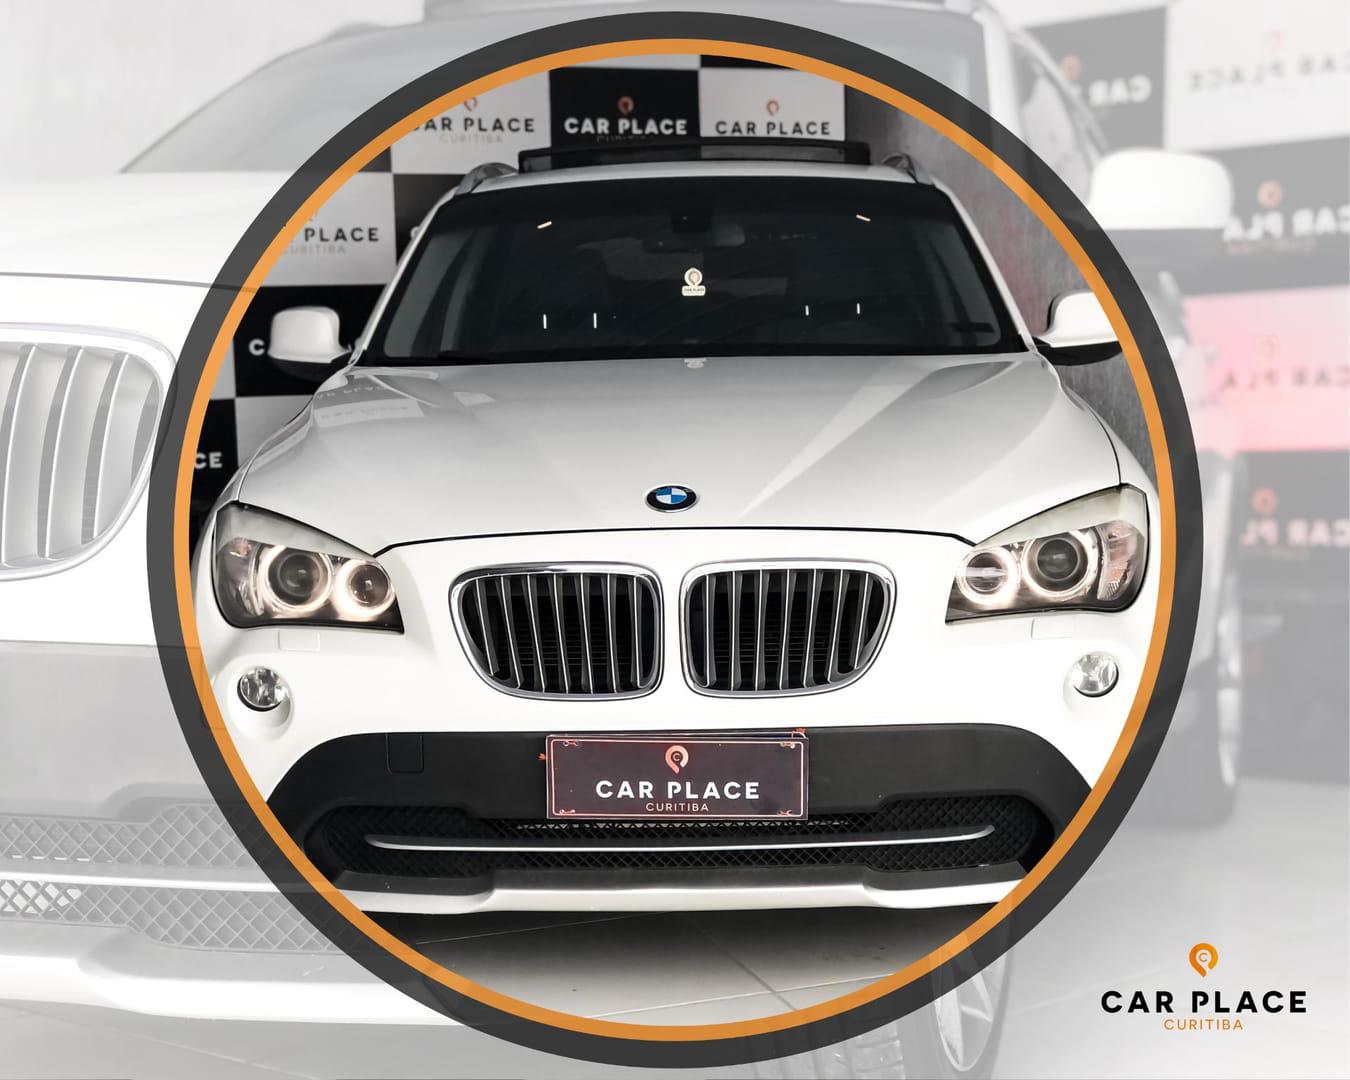 BMW X1 XDRIVE 2.8I VM31